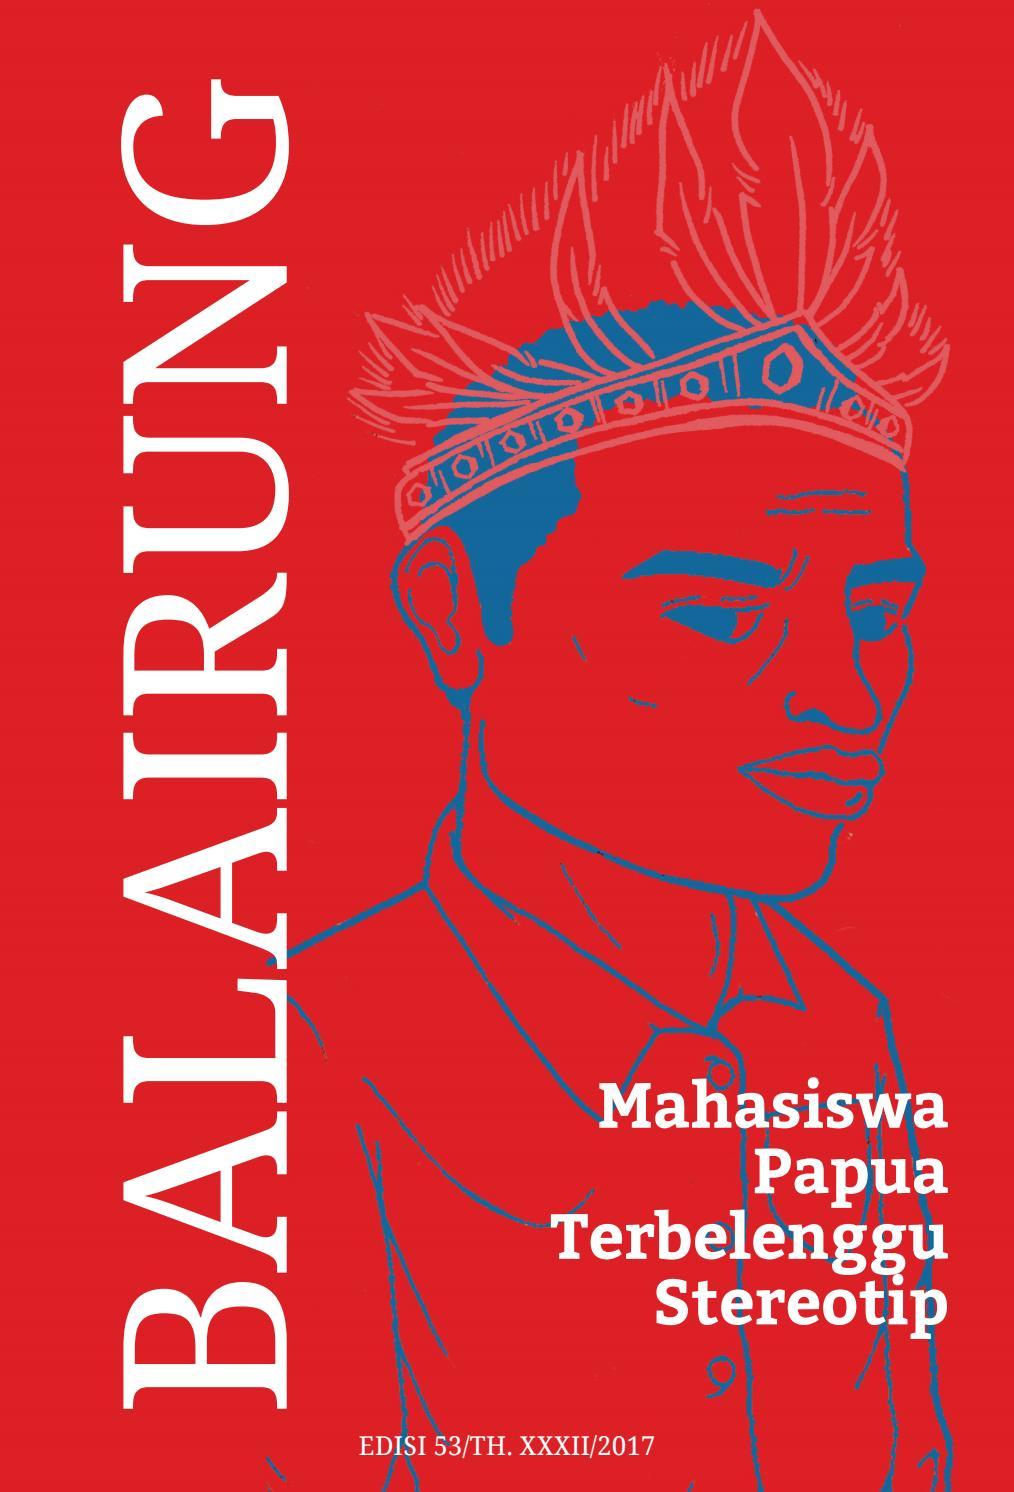 Majalah Balairung Edisi 53 Mahasiswa Papua Terbelenggu Stereotip By